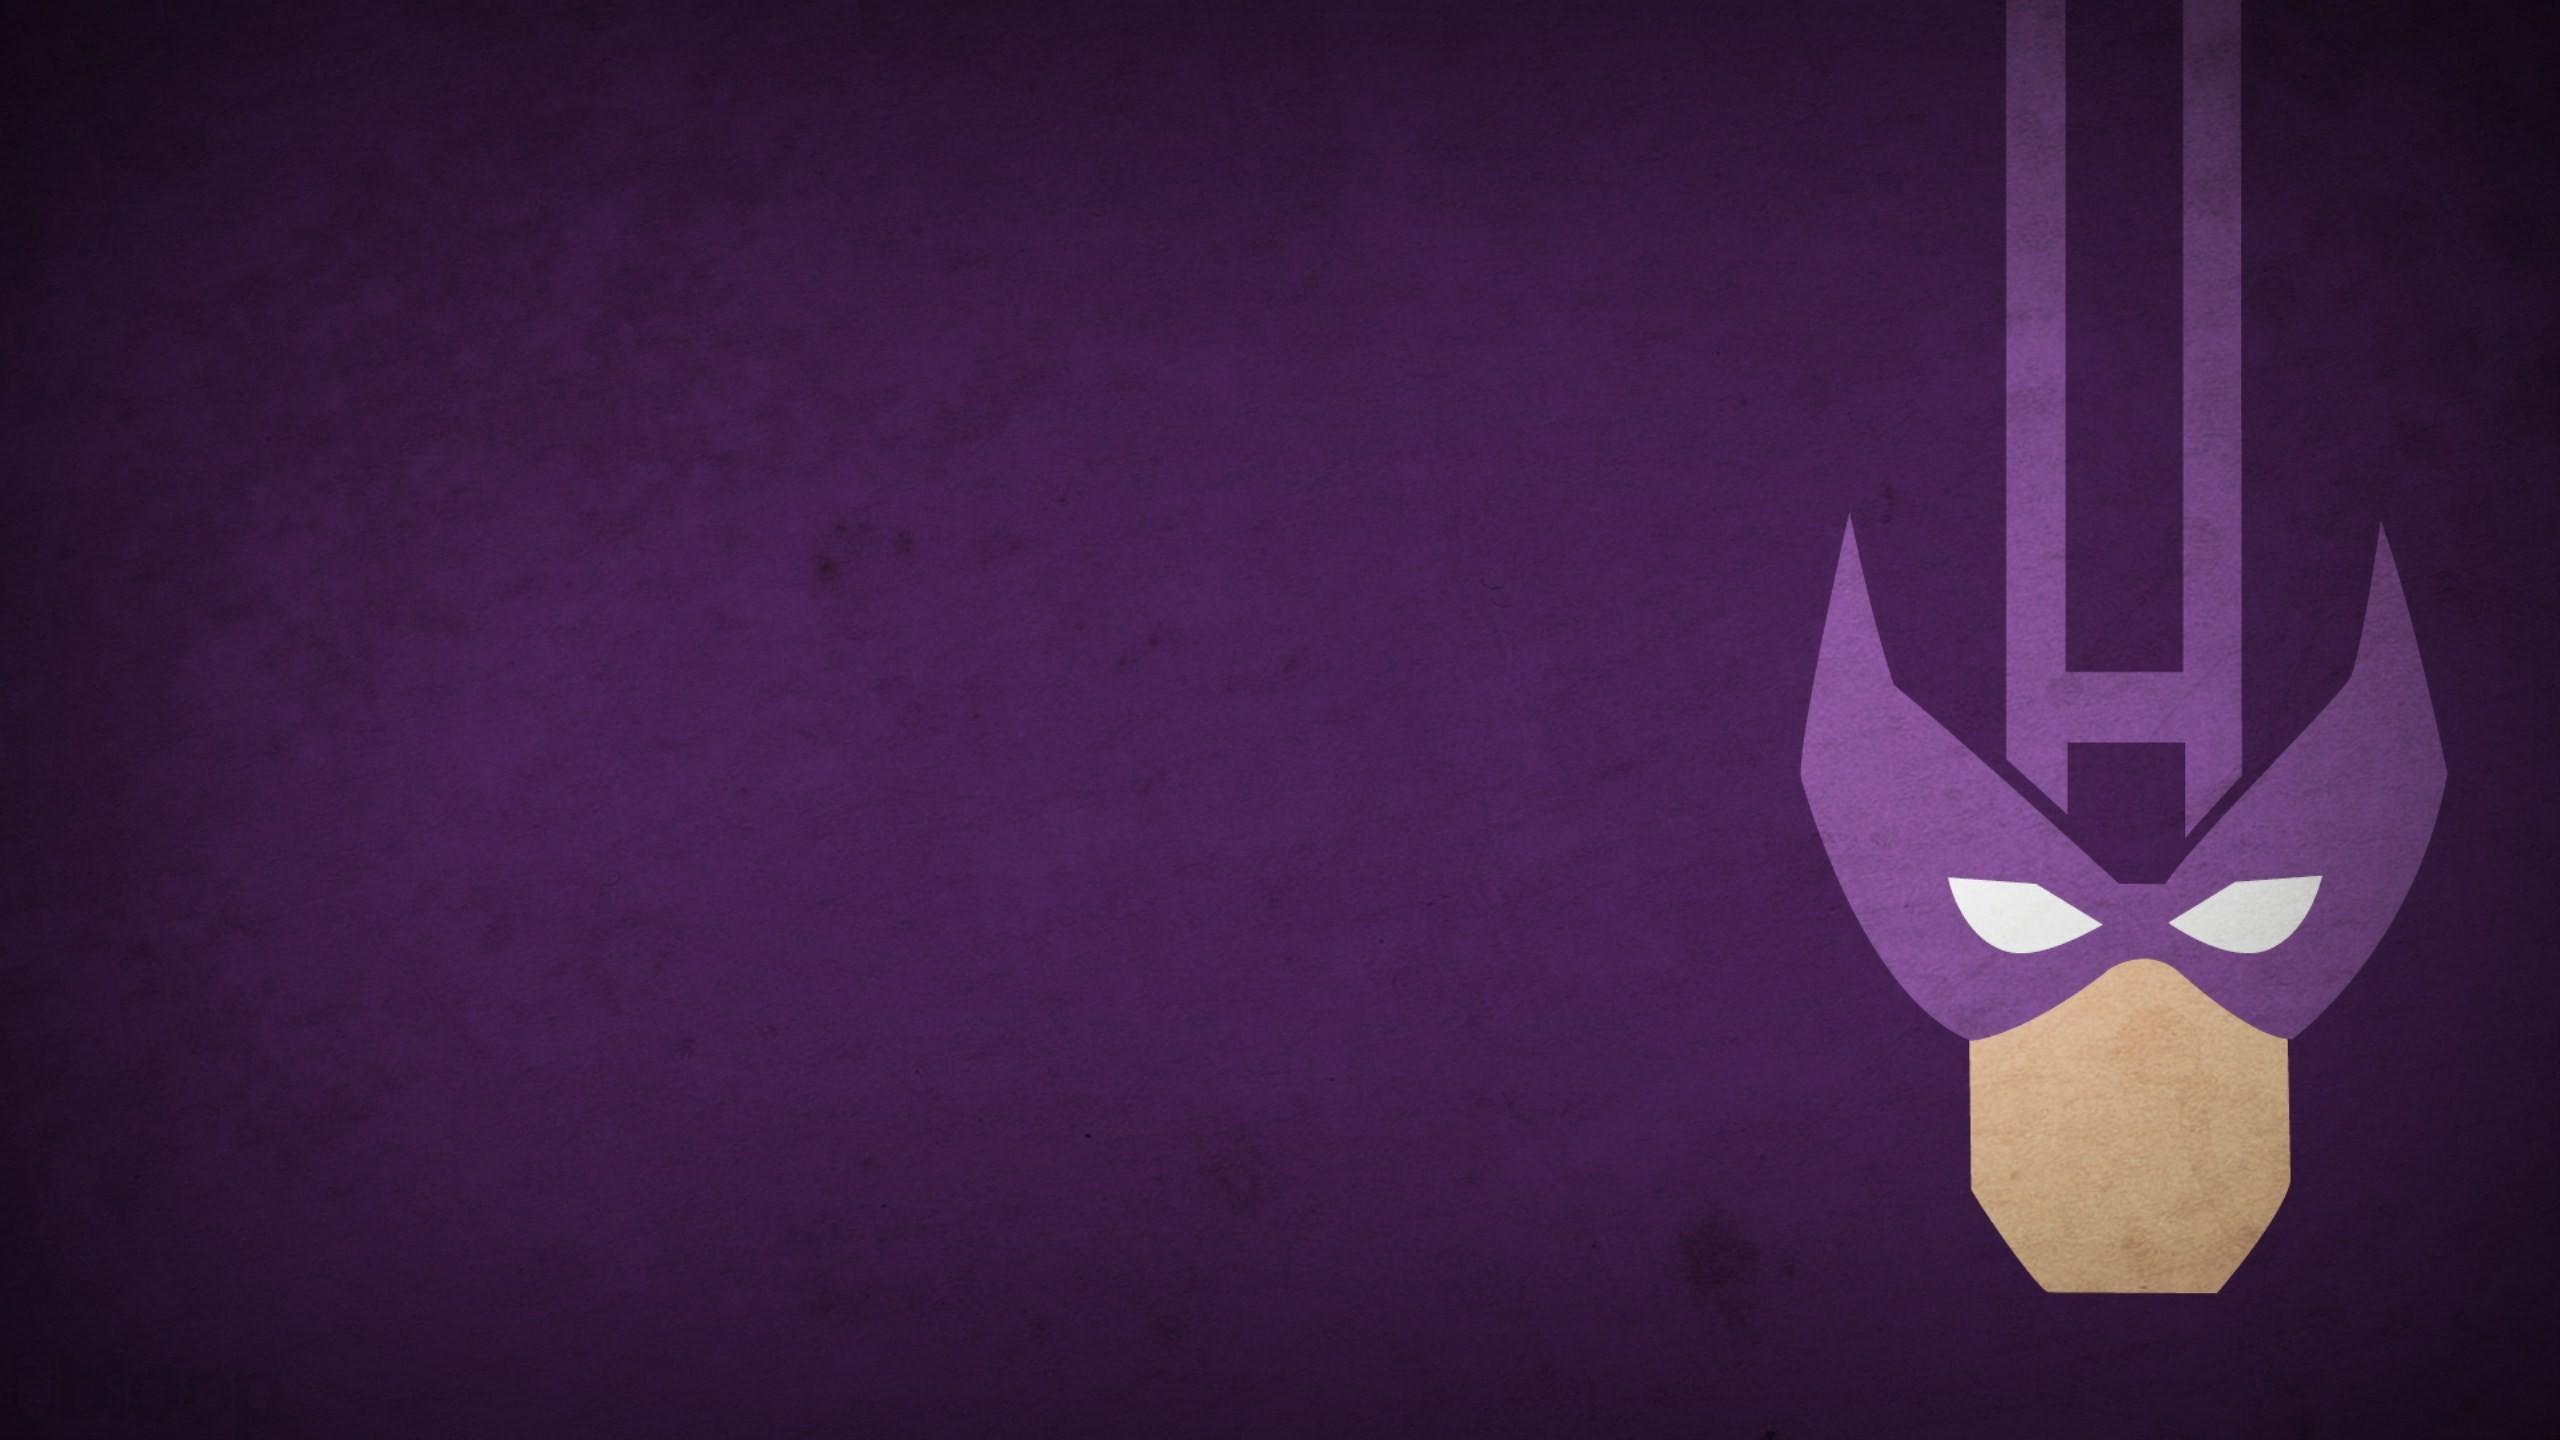 Res: 2560x1440, Minimalistic Marvel Comics Hawkeye purple background blo0p wallpaper |   | 222610 | WallpaperUP